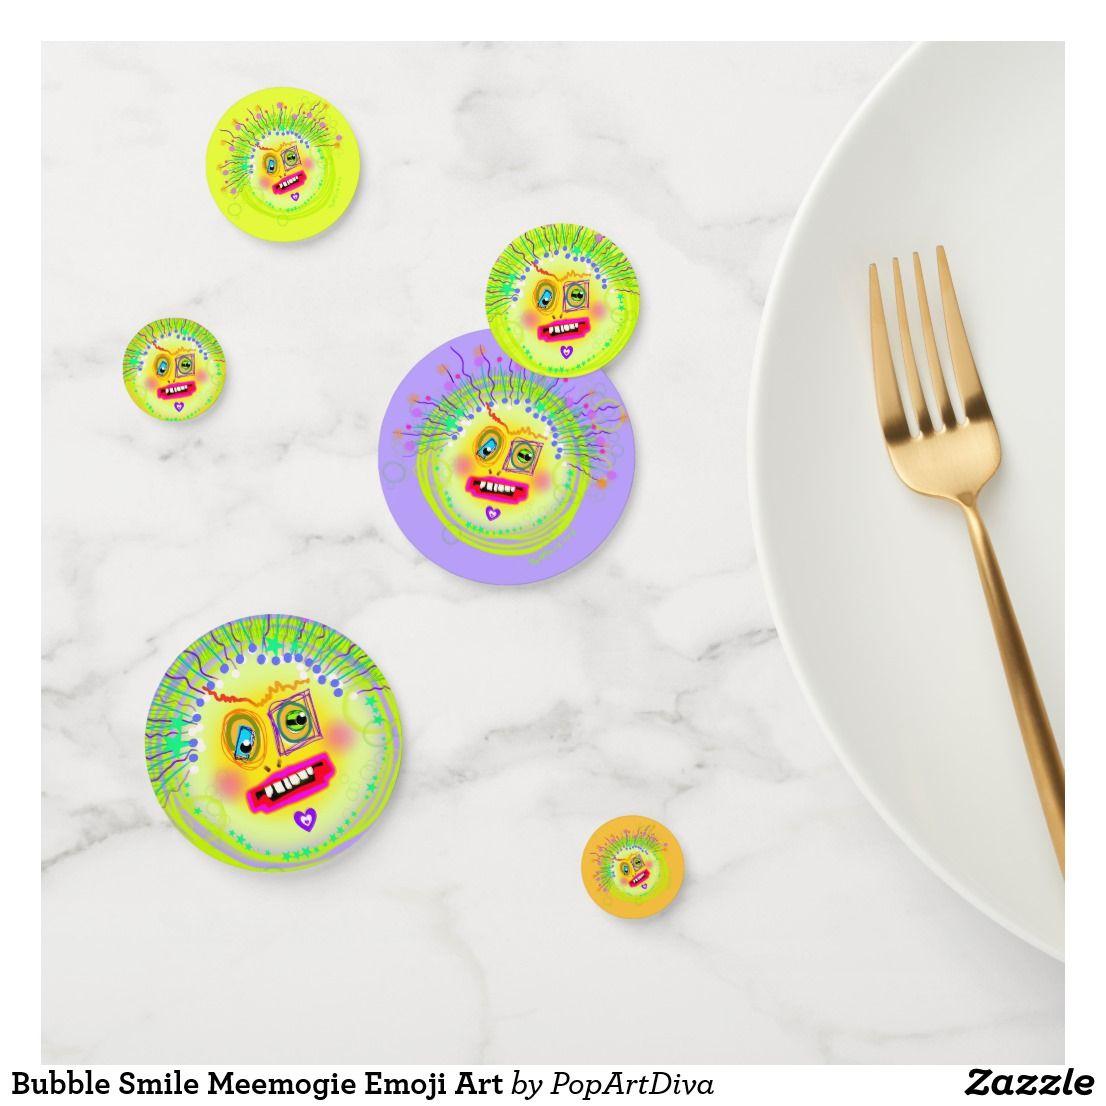 Bubble Smile Meemogie Emoji Art Confetti